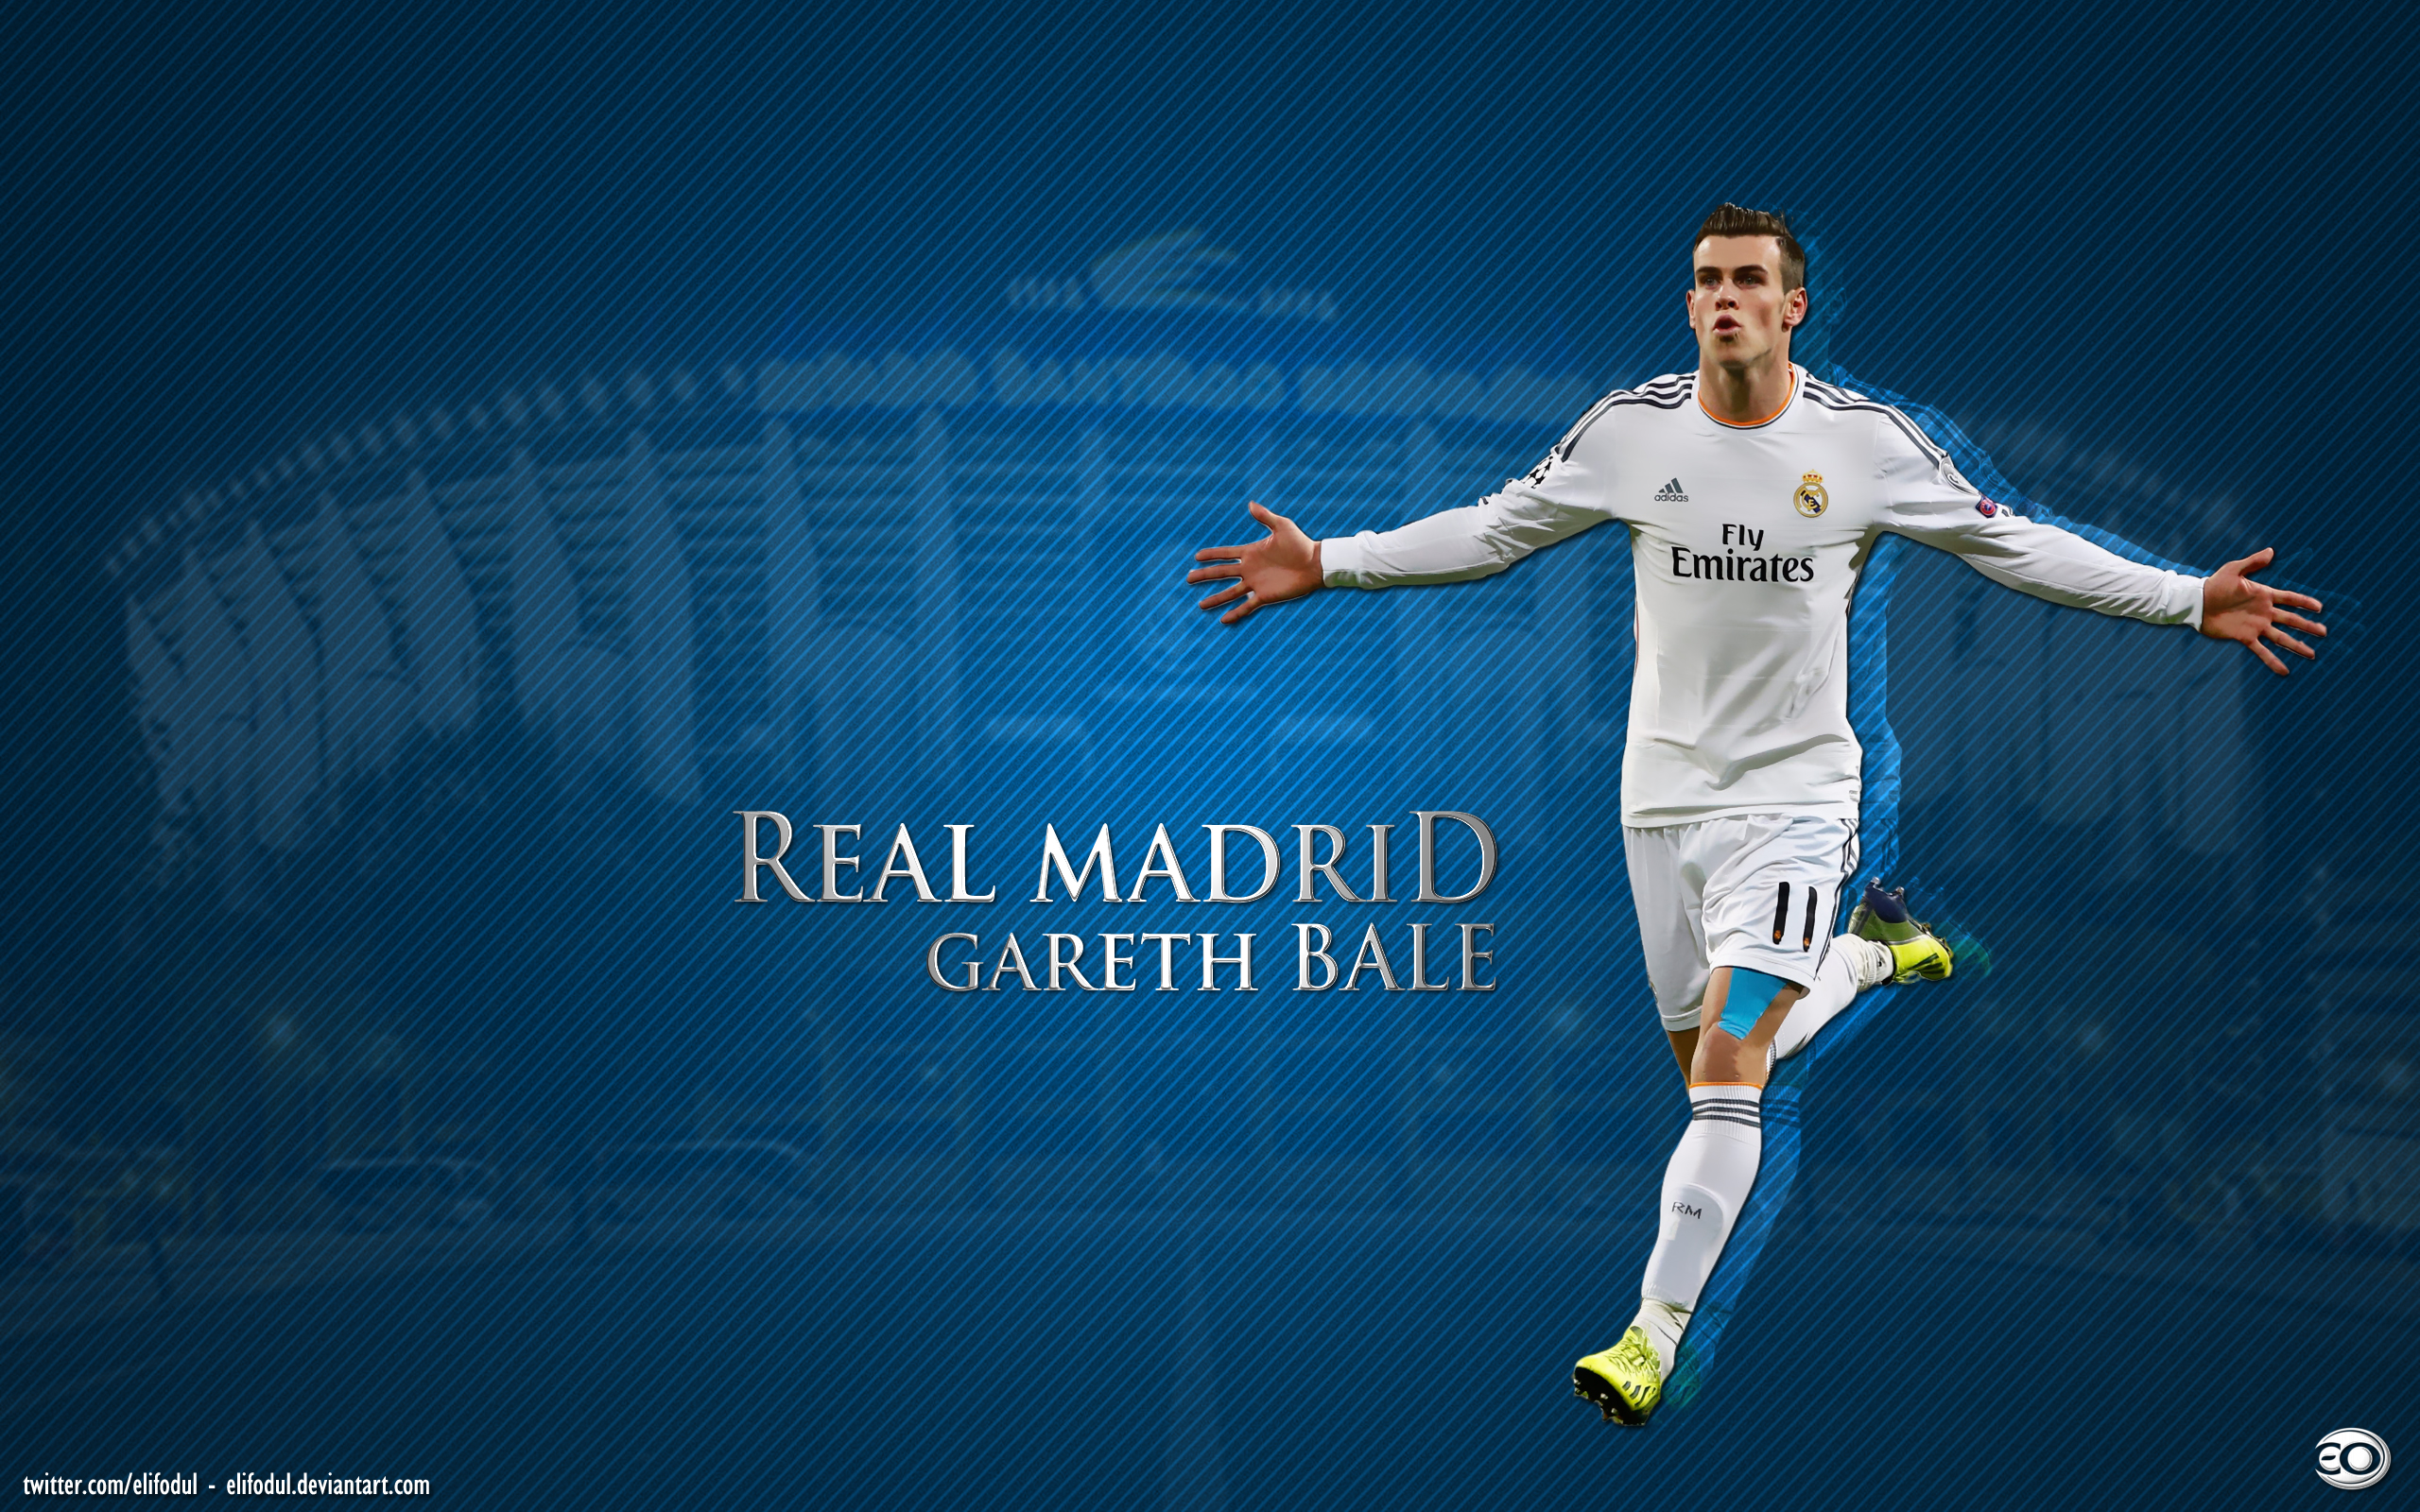 Ronaldo Hd Wallpapers Football Gareth Bale Wallpaper